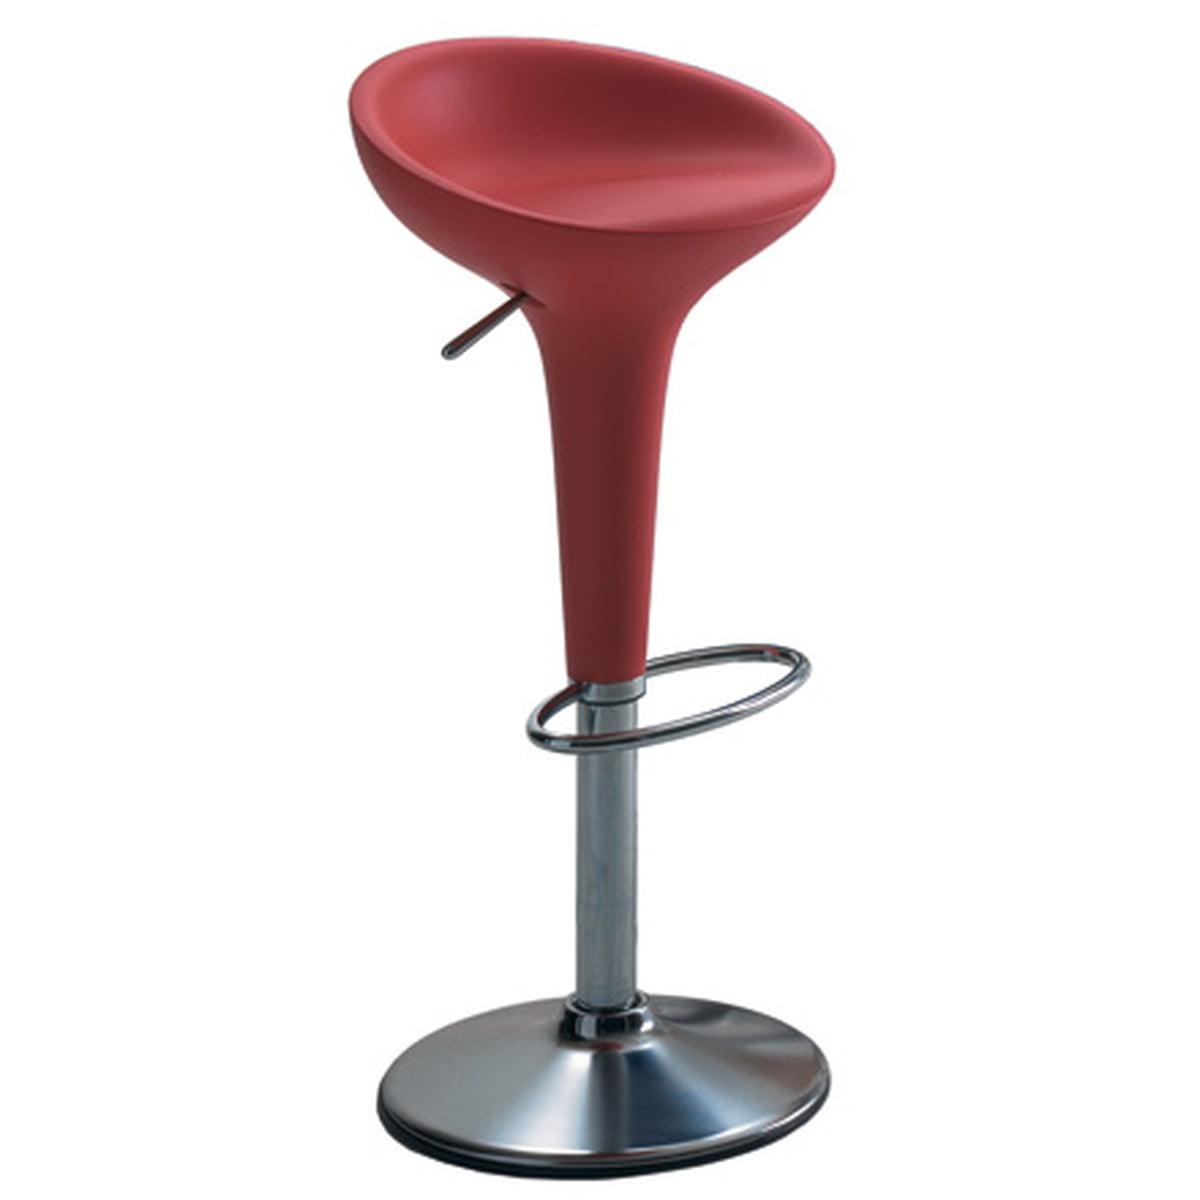 Pleasing Magis Bombo Bar Stool Height Adjustable Grey Anthracite Ibusinesslaw Wood Chair Design Ideas Ibusinesslaworg